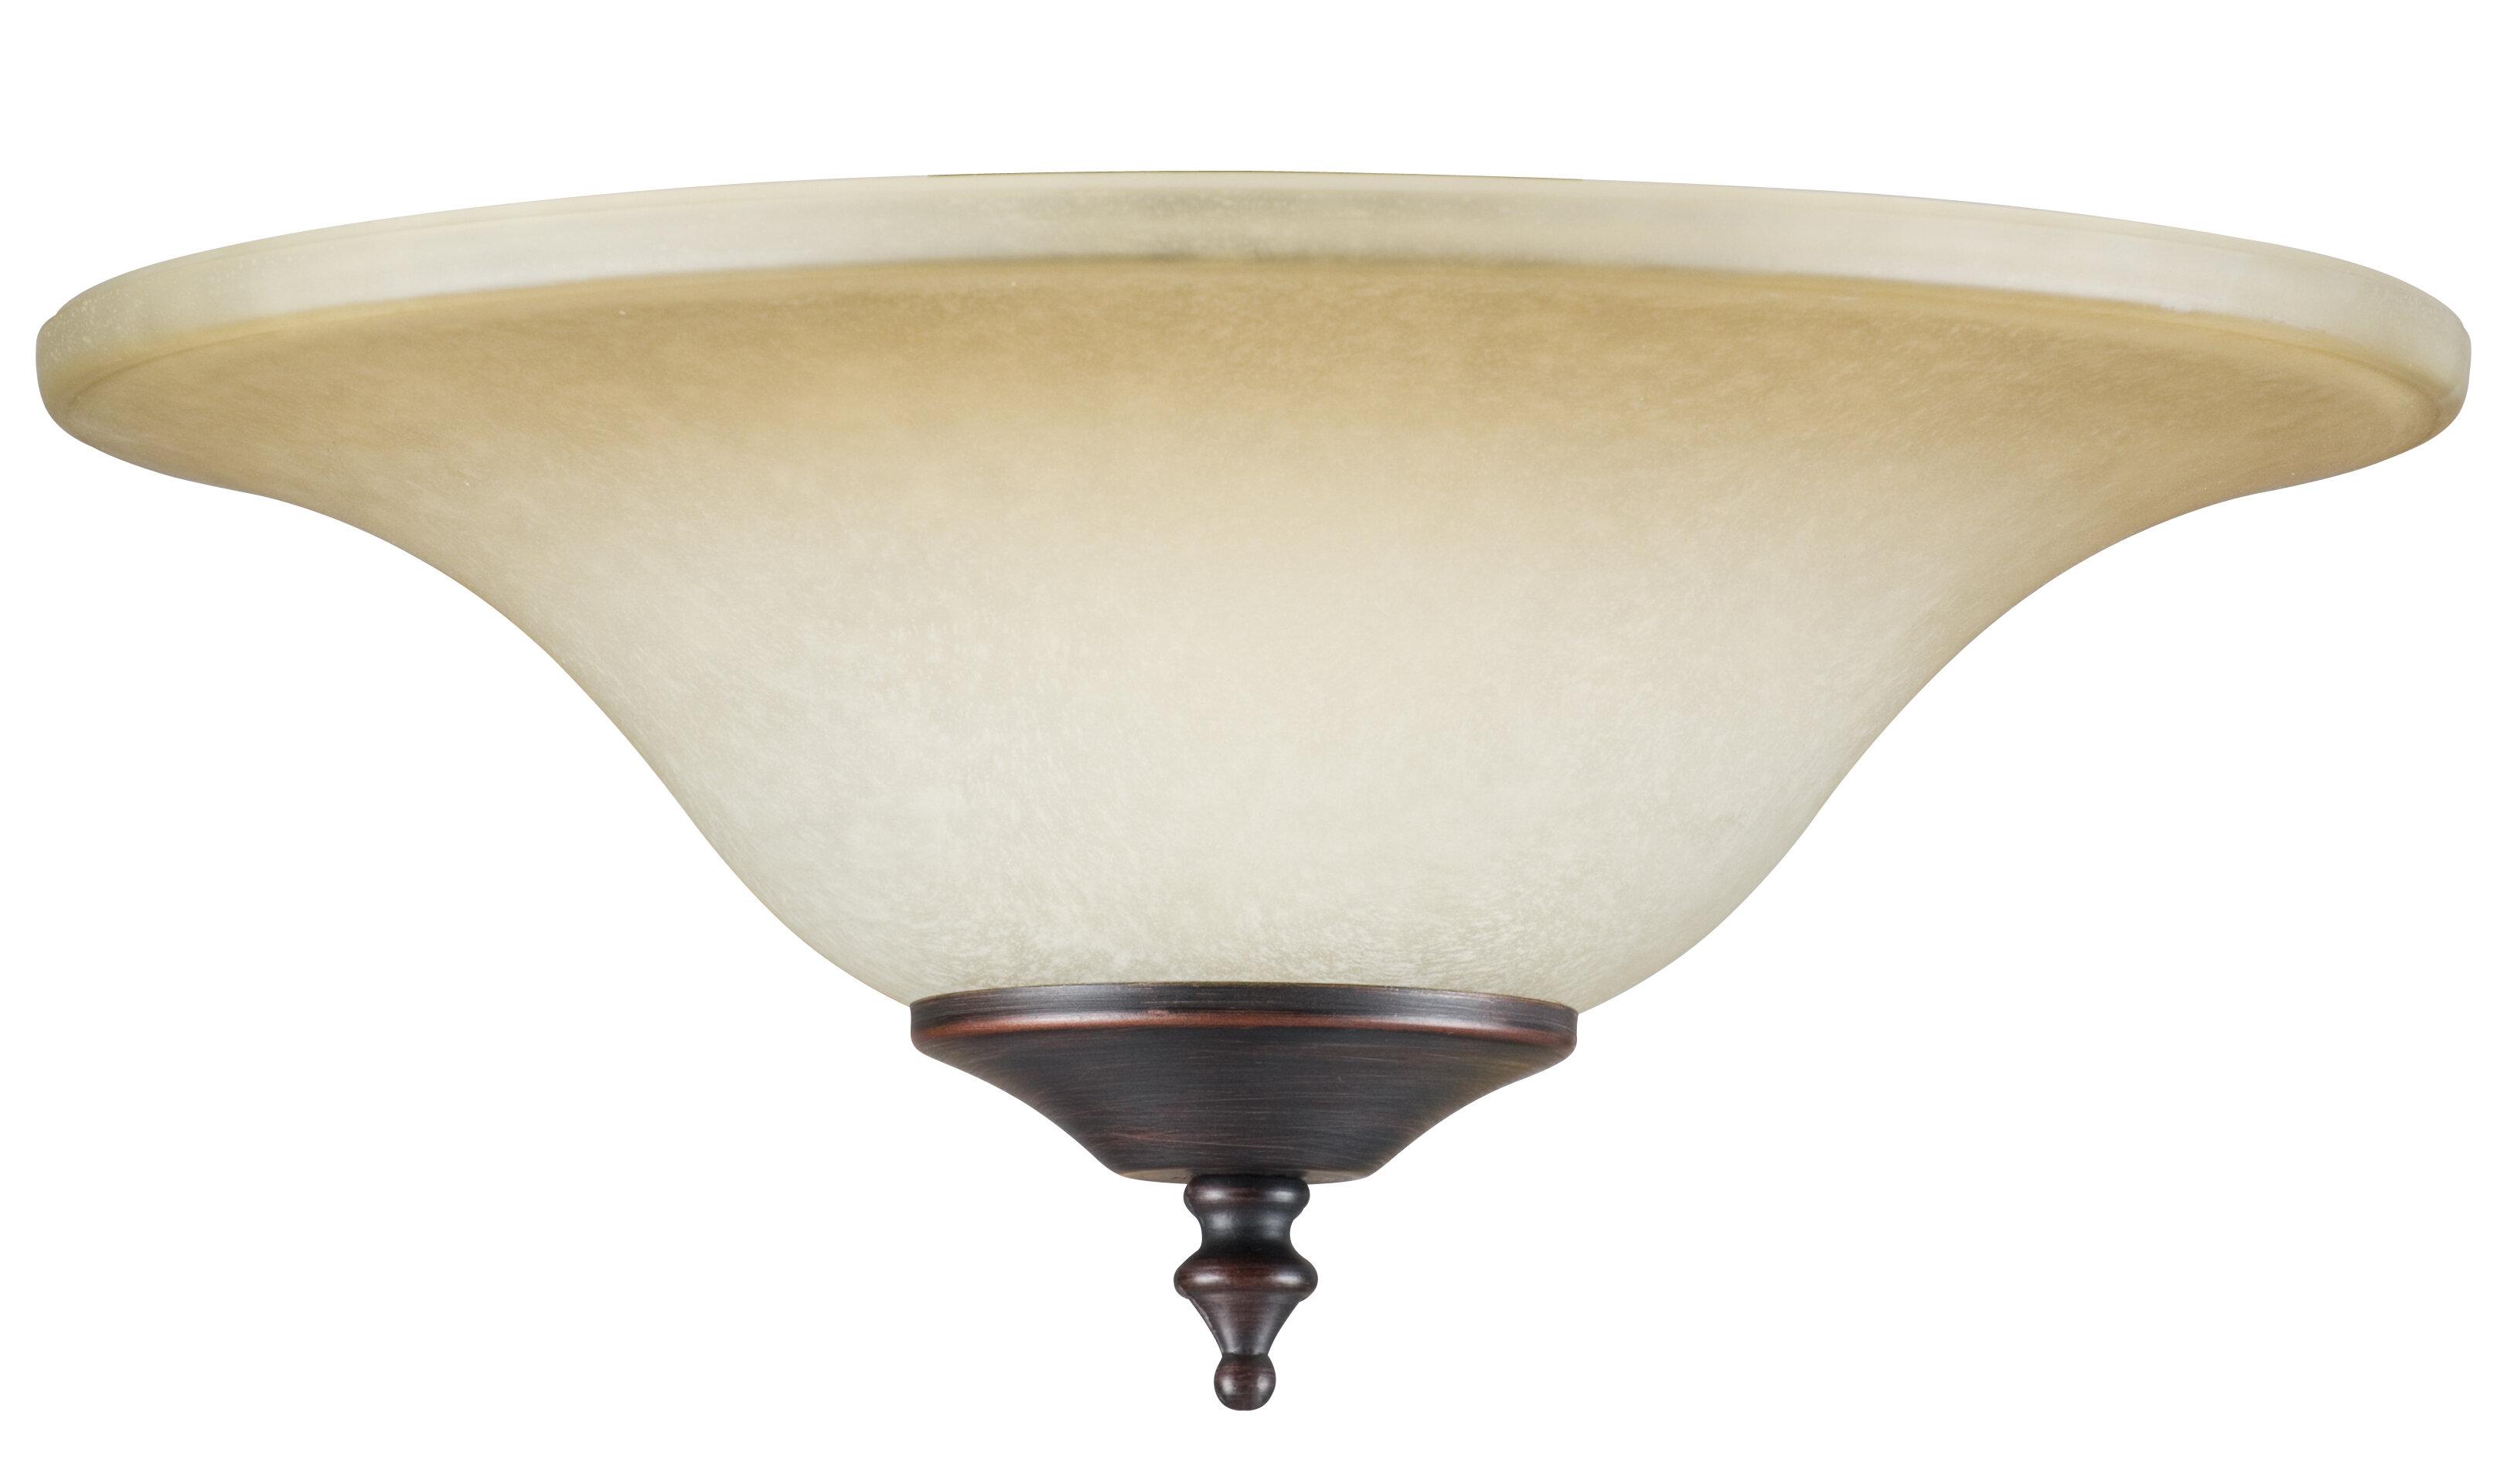 Alcott hill 115 glass ceiling fan bowl shade reviews wayfair aloadofball Choice Image